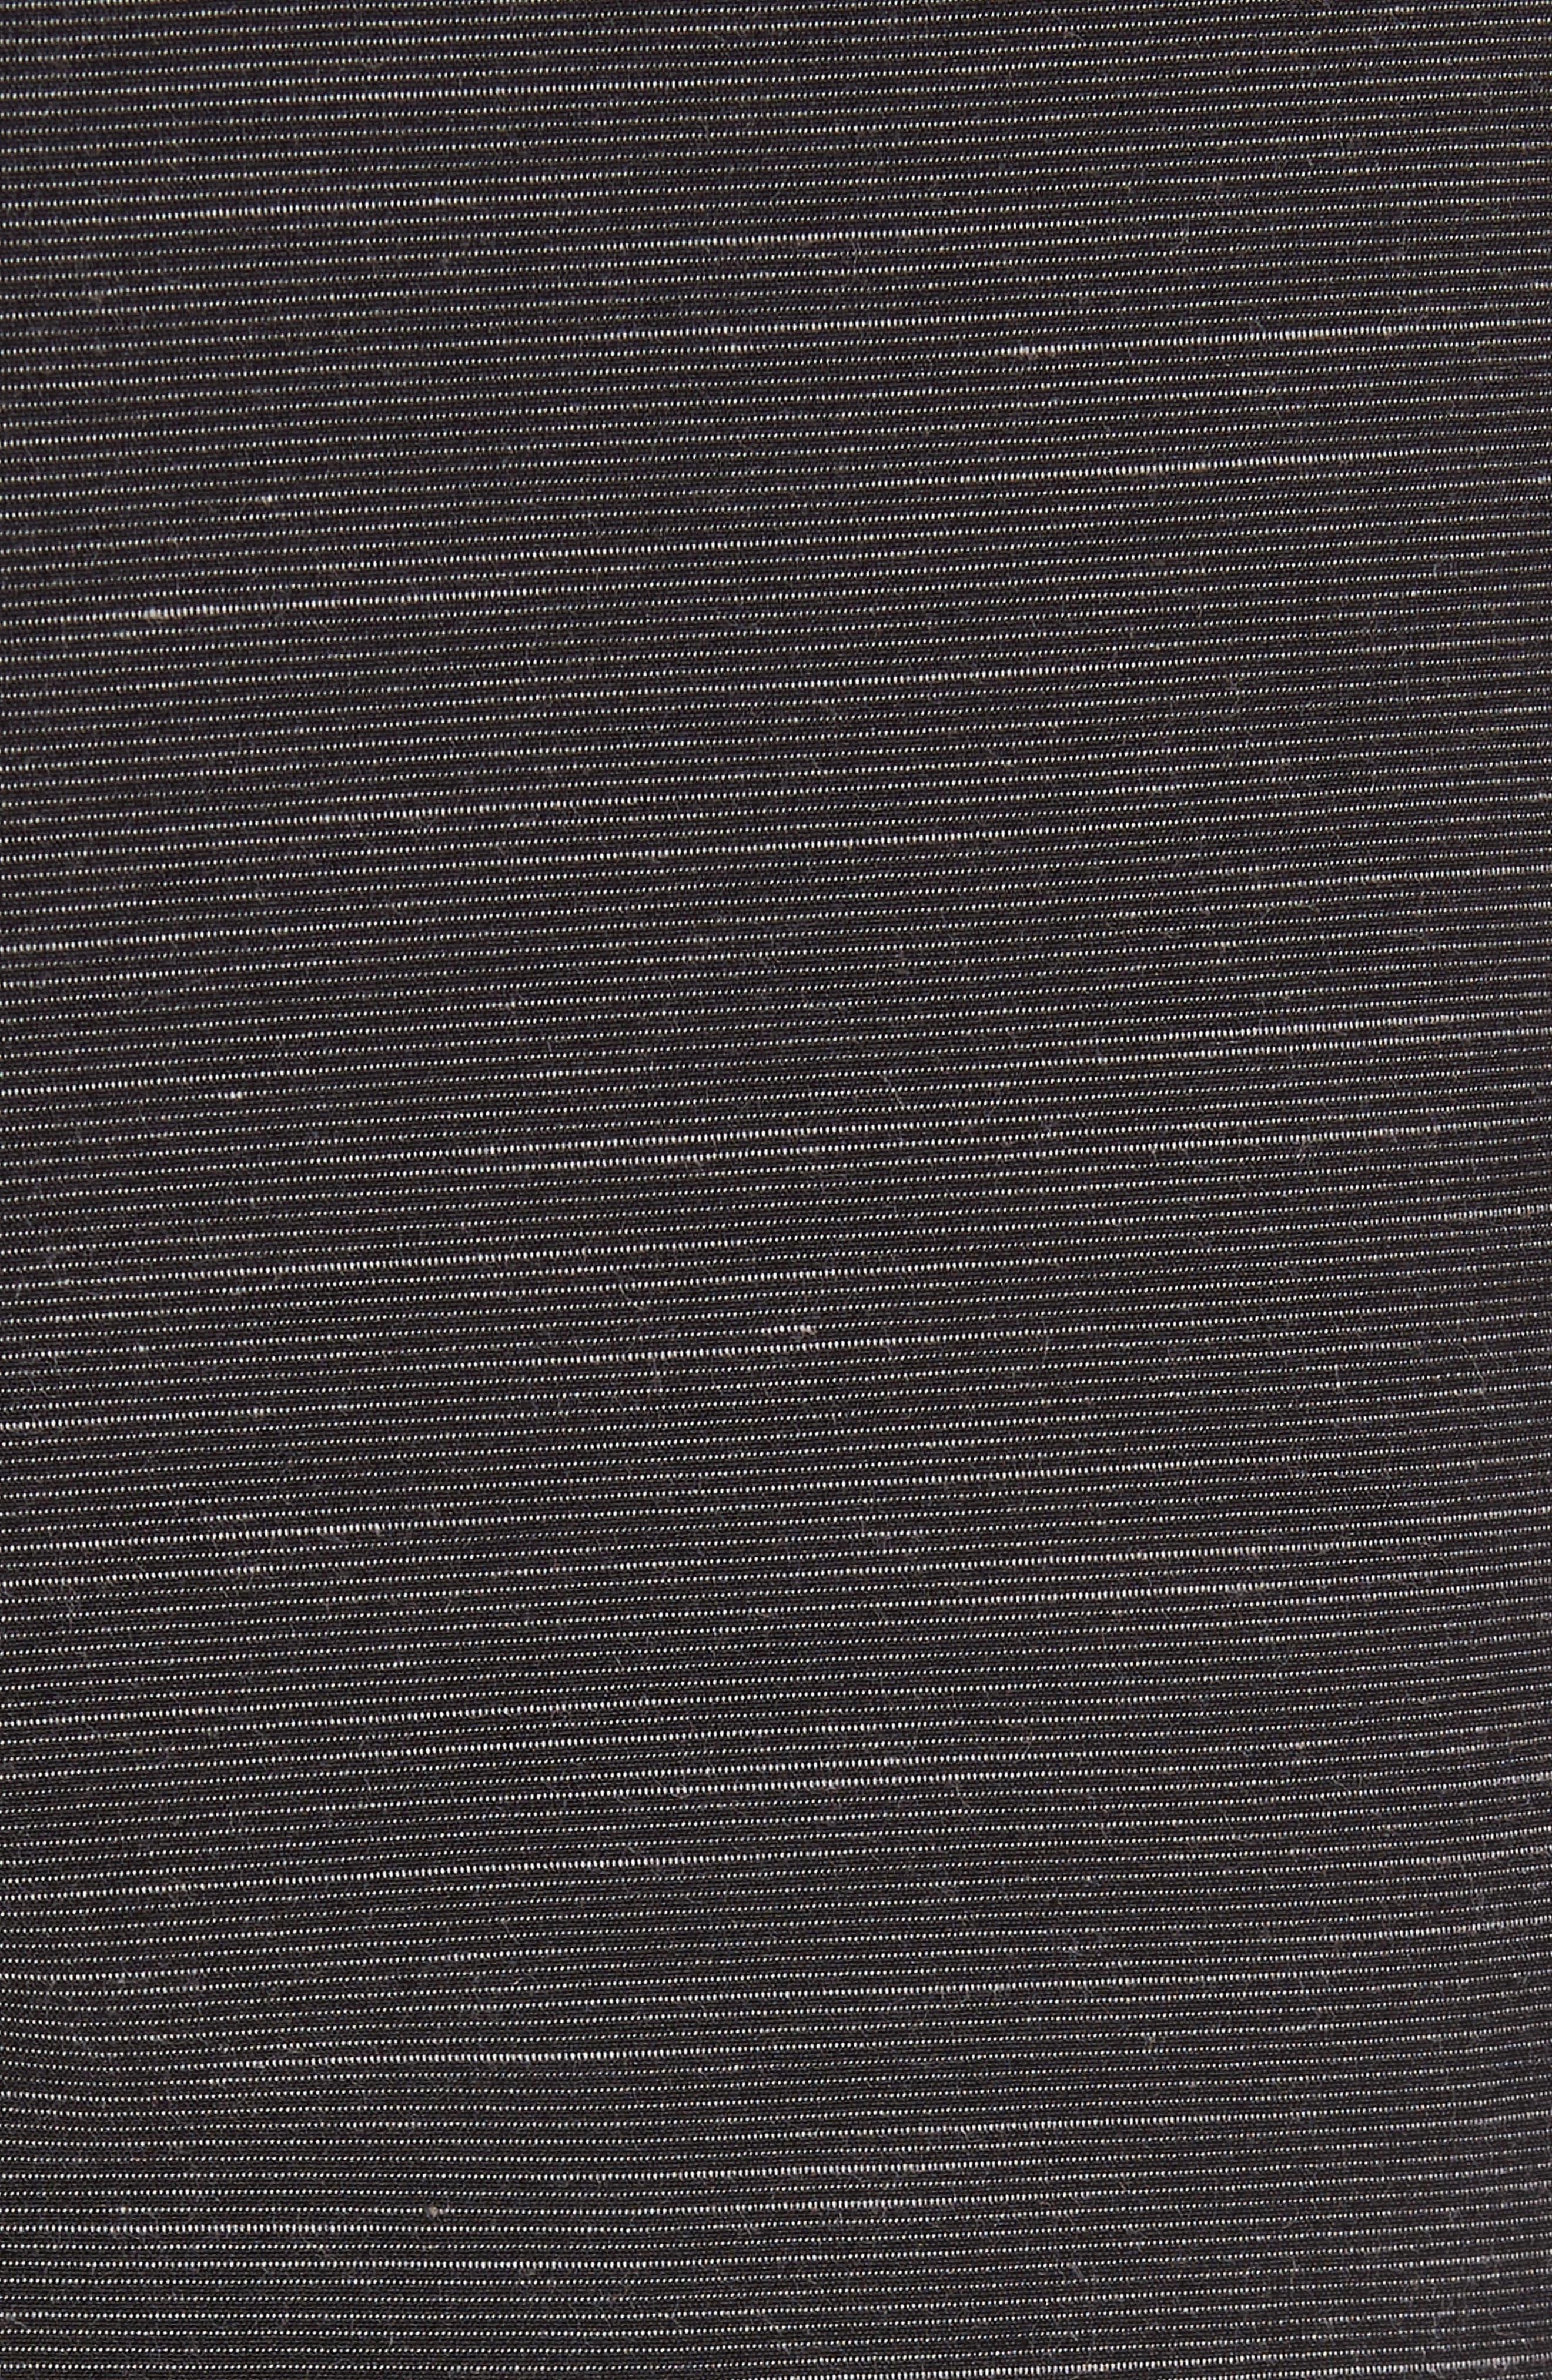 73 X Short Board Shorts,                             Alternate thumbnail 5, color,                             001